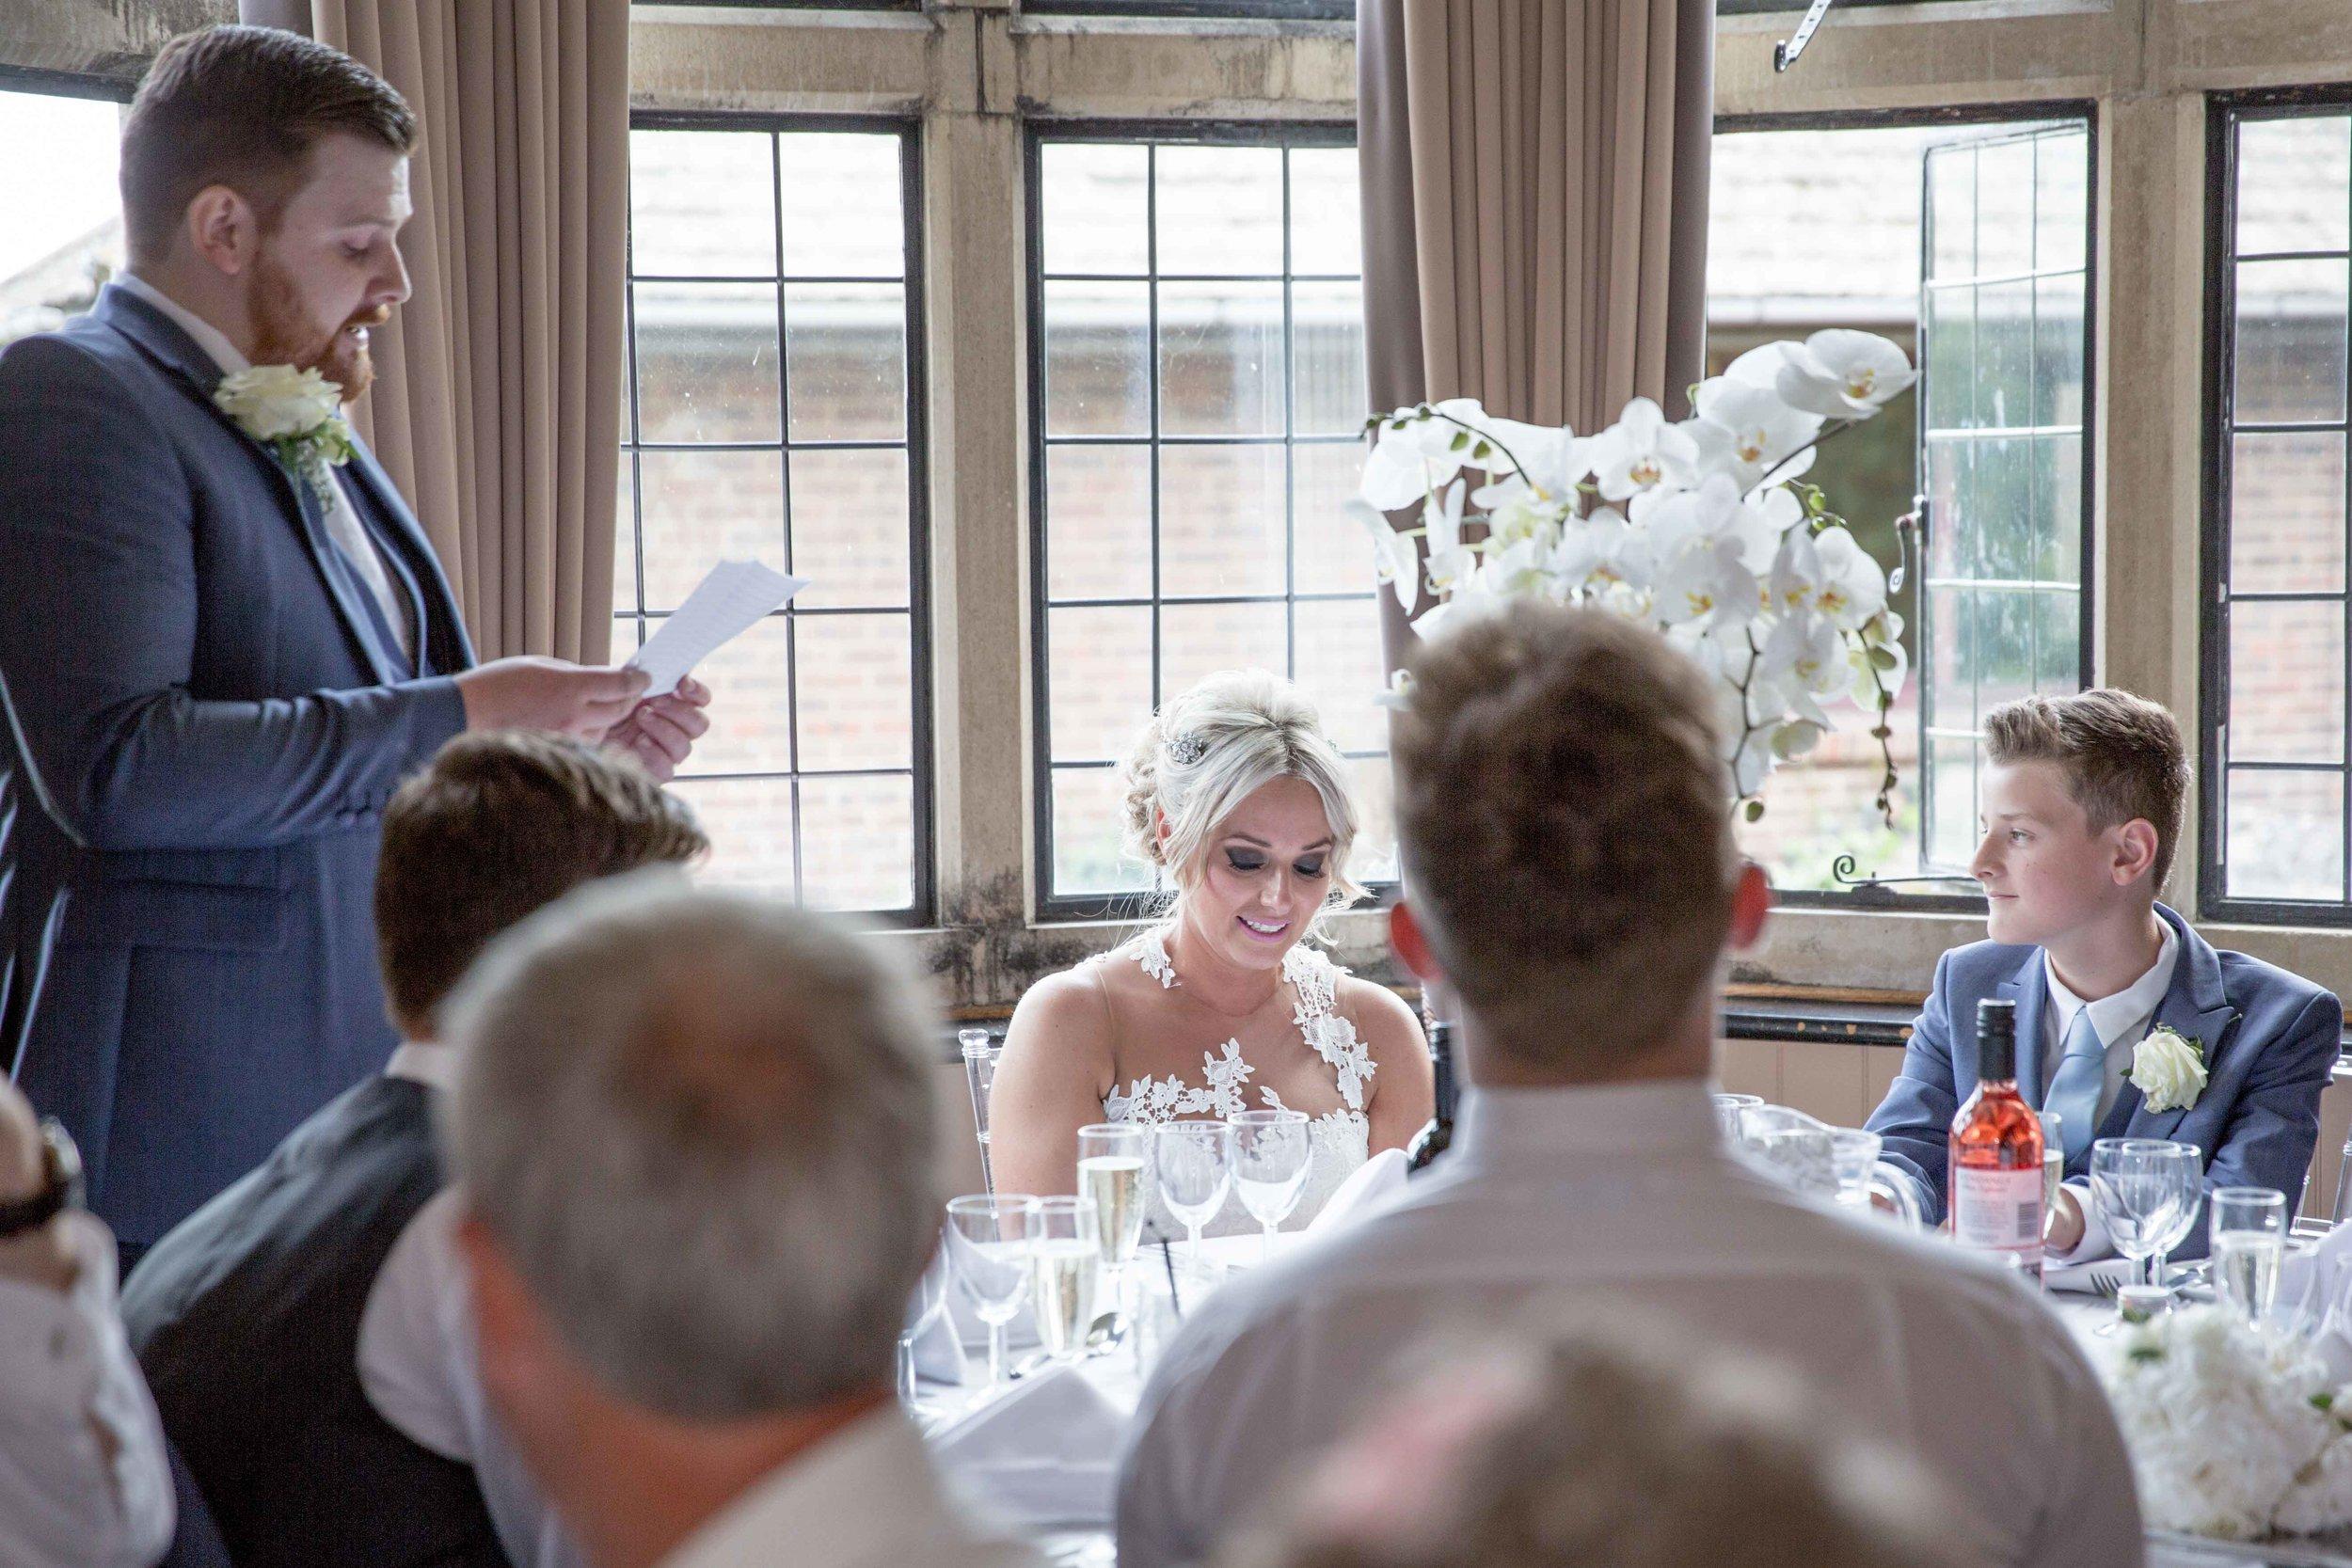 cotswold-wedding-photography-at-stonehouse-court-hotel-natalia-smith-photography-gloucestershire-wedding-photographer-80.jpg